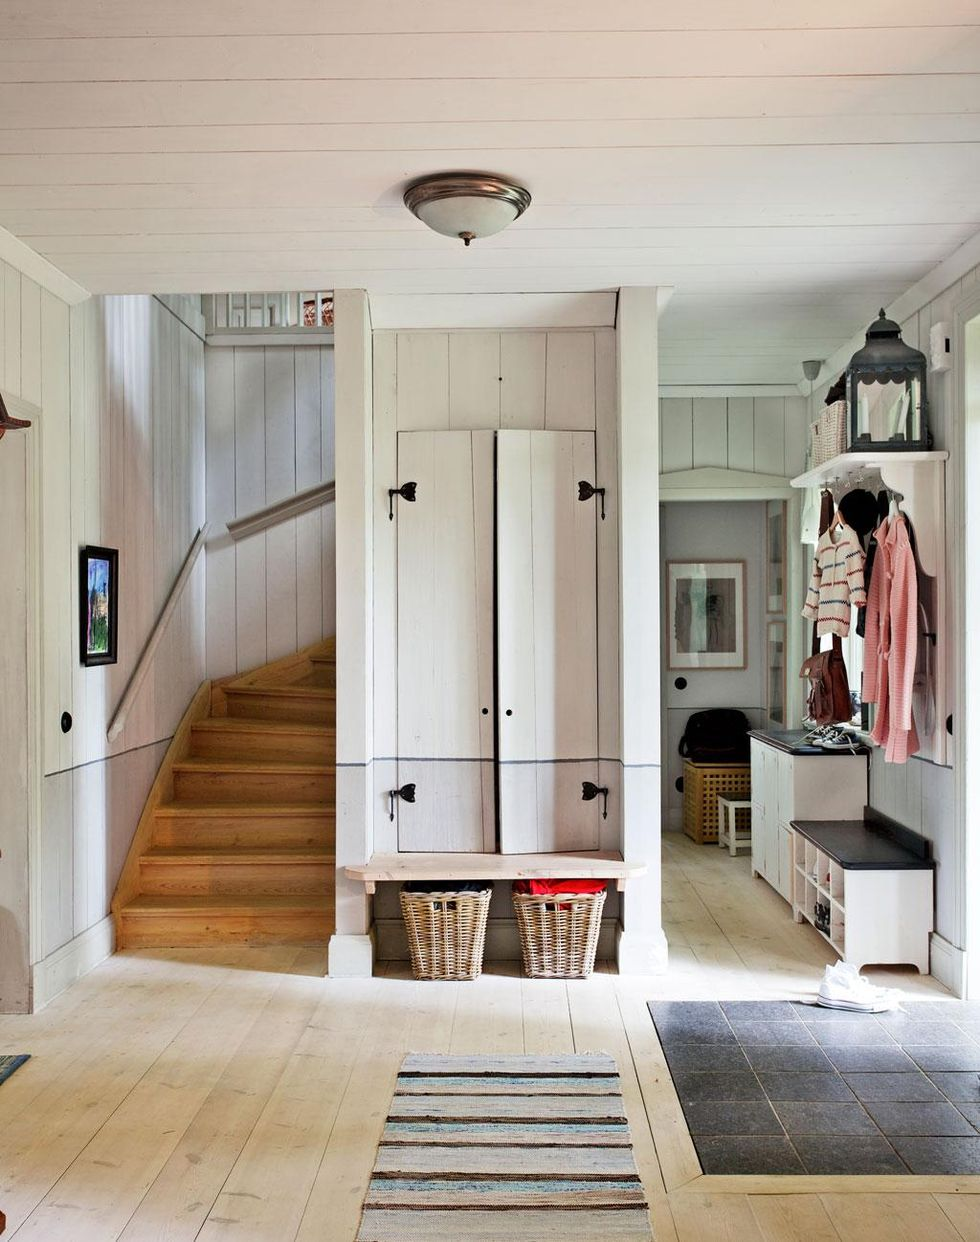 Modern Home Nda By No 555 Architectural Design Office: Toppmodernt Hus I Gammal Stil